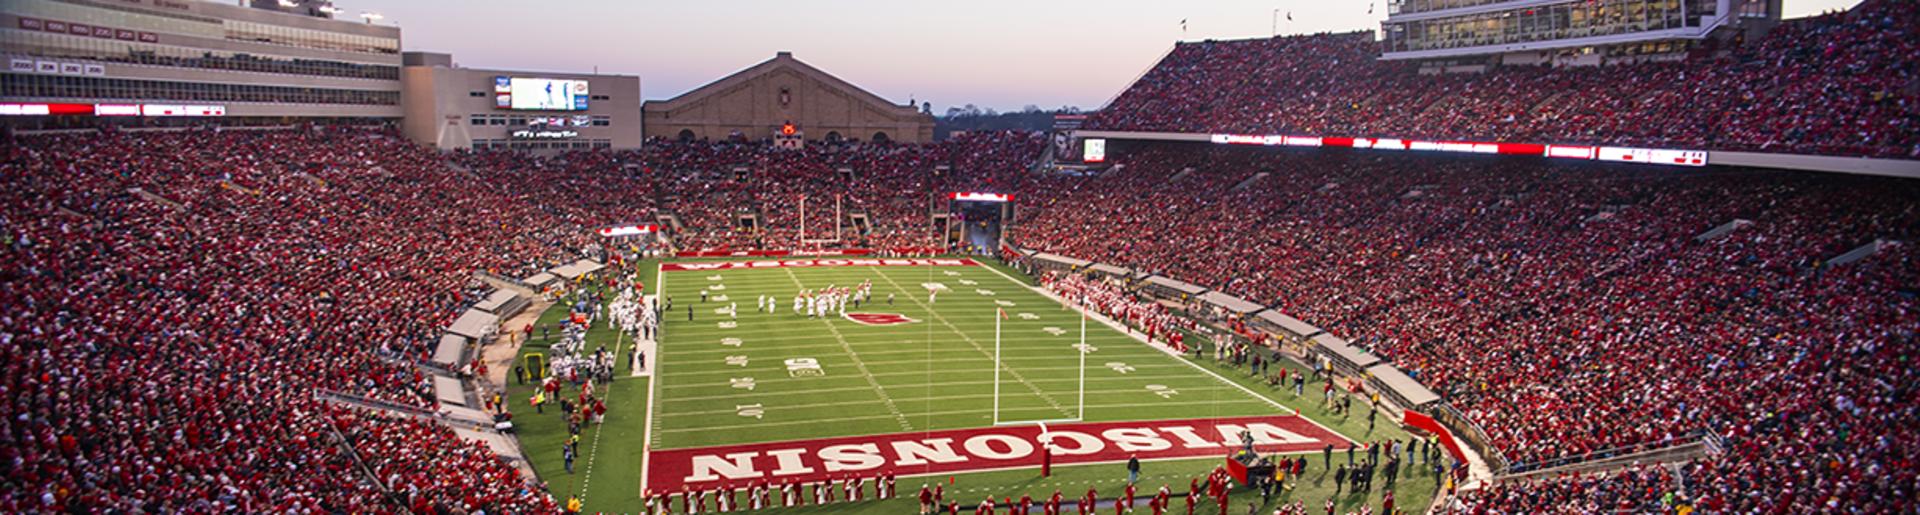 Wisconsin Stadium